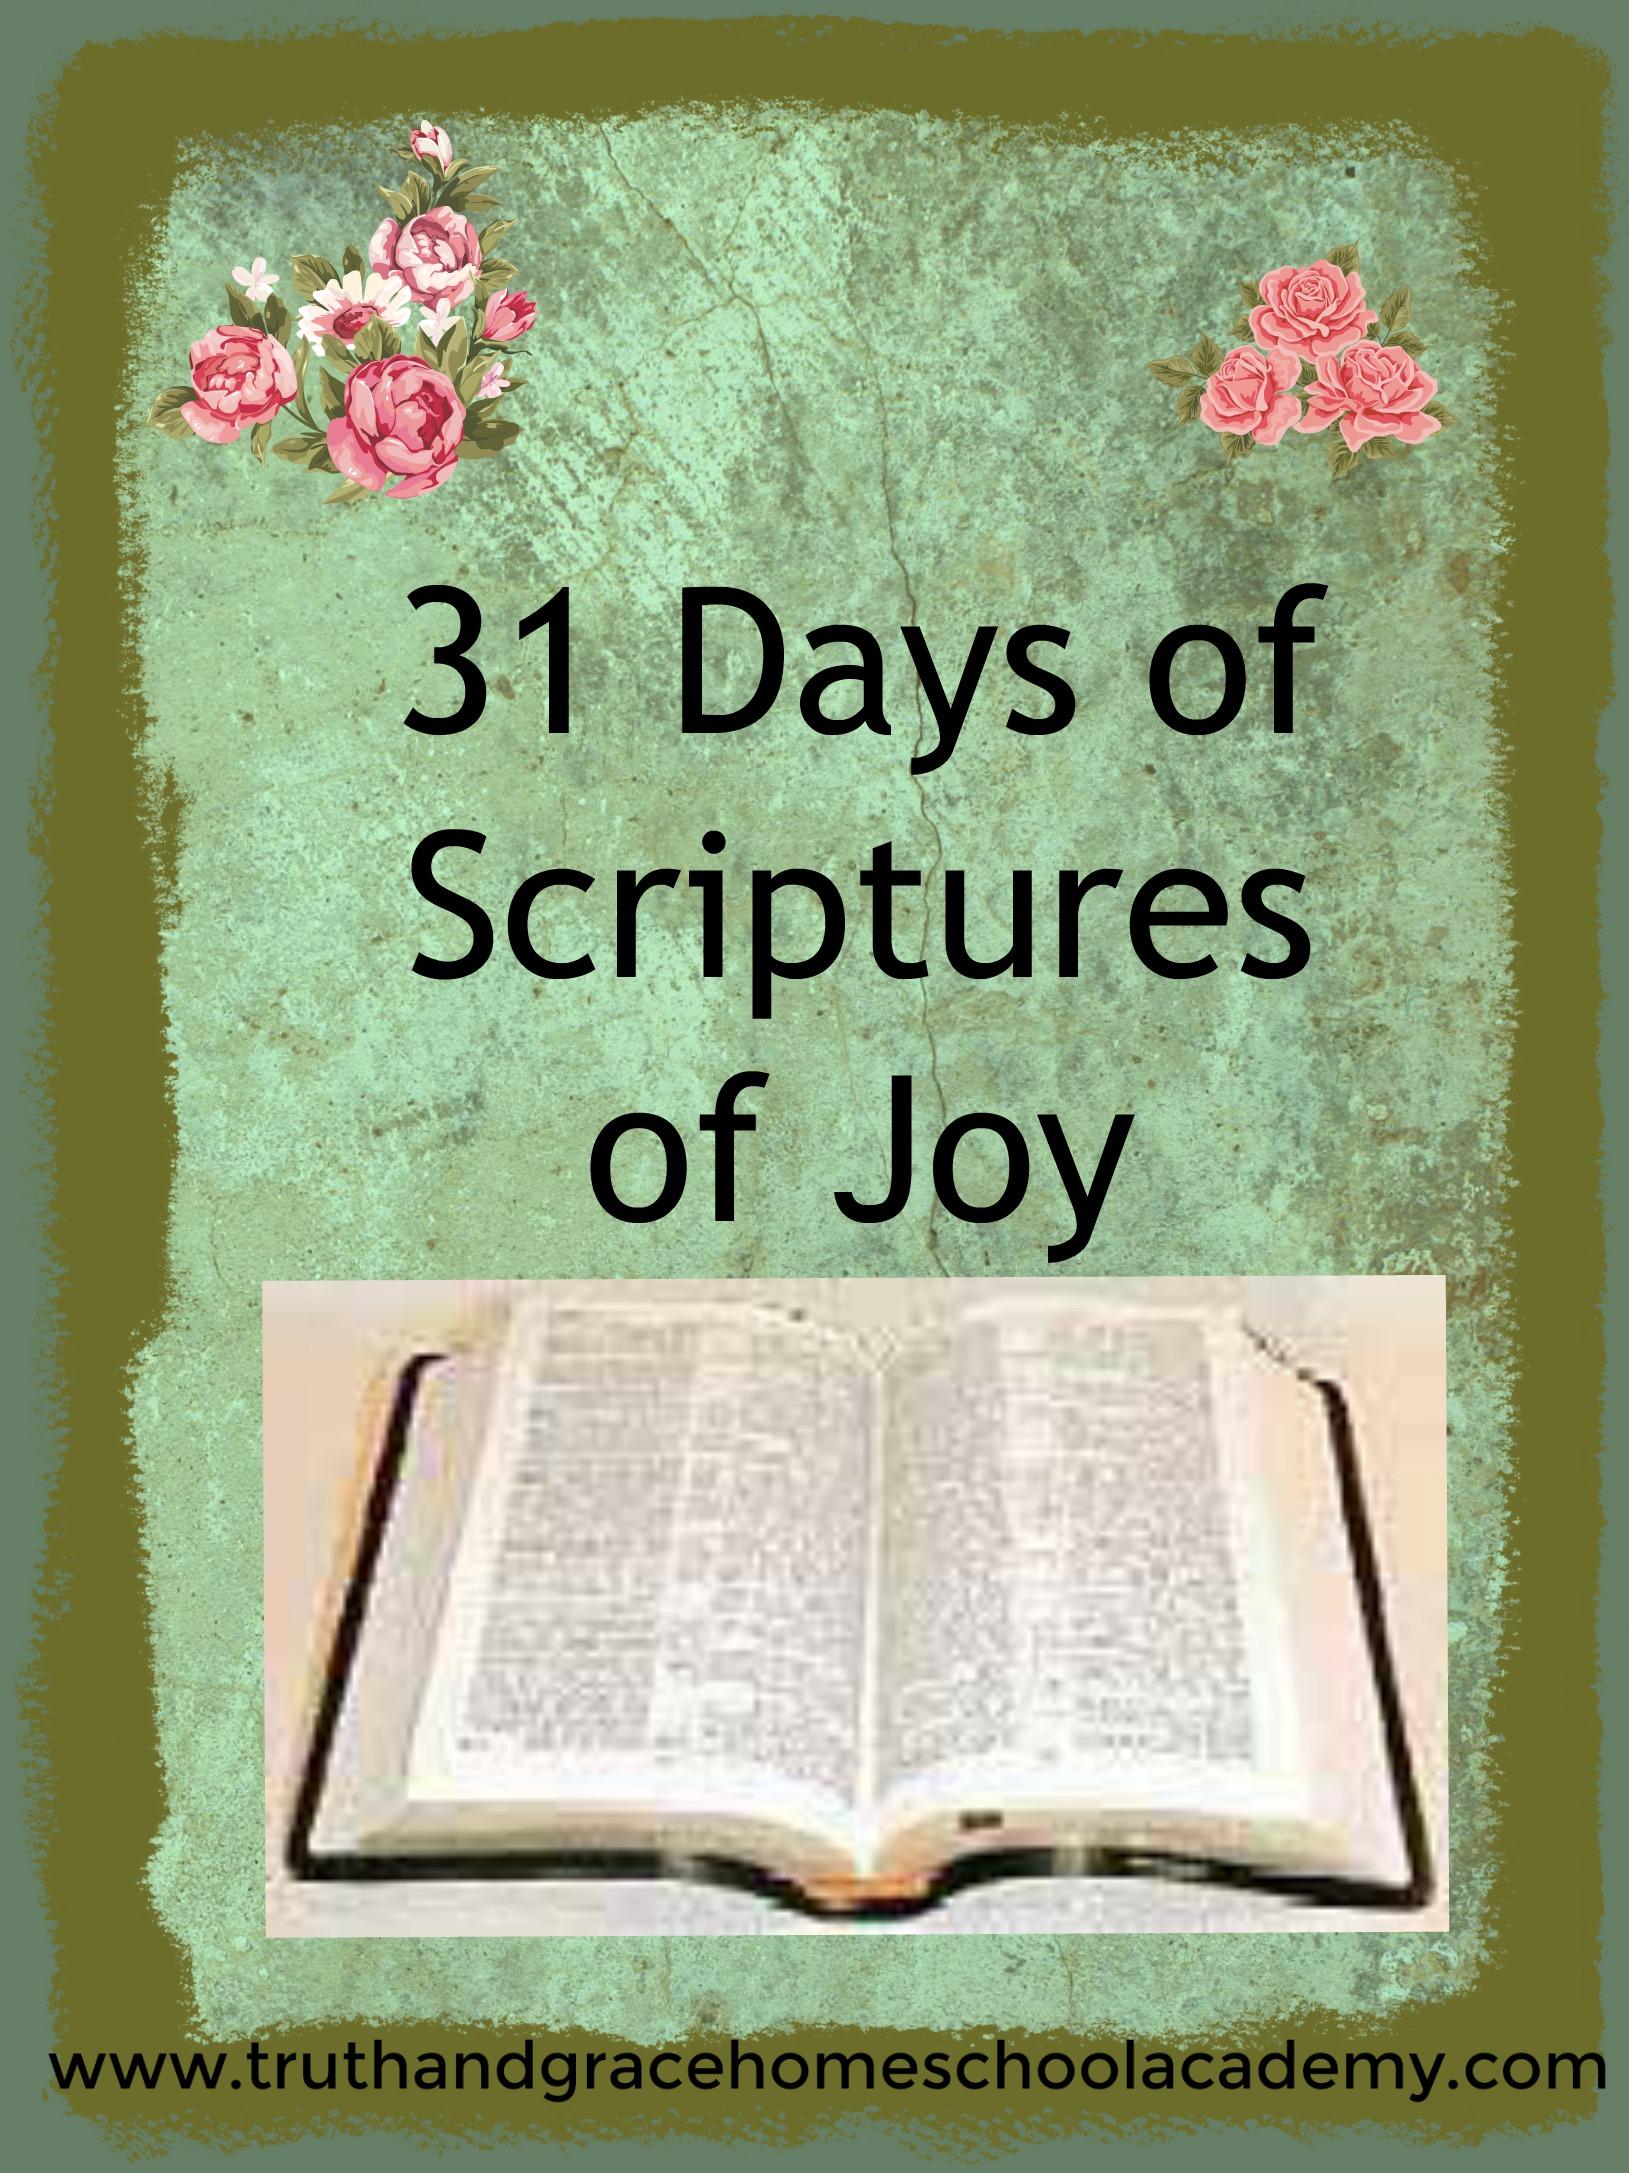 Contemporary Morning 2016 Scriptures Joy Series Truthandgracewritingandlifecoaching Scriptures On Joy King James Version Scriptures On Joy Comes Join Me inspiration Scriptures On Joy